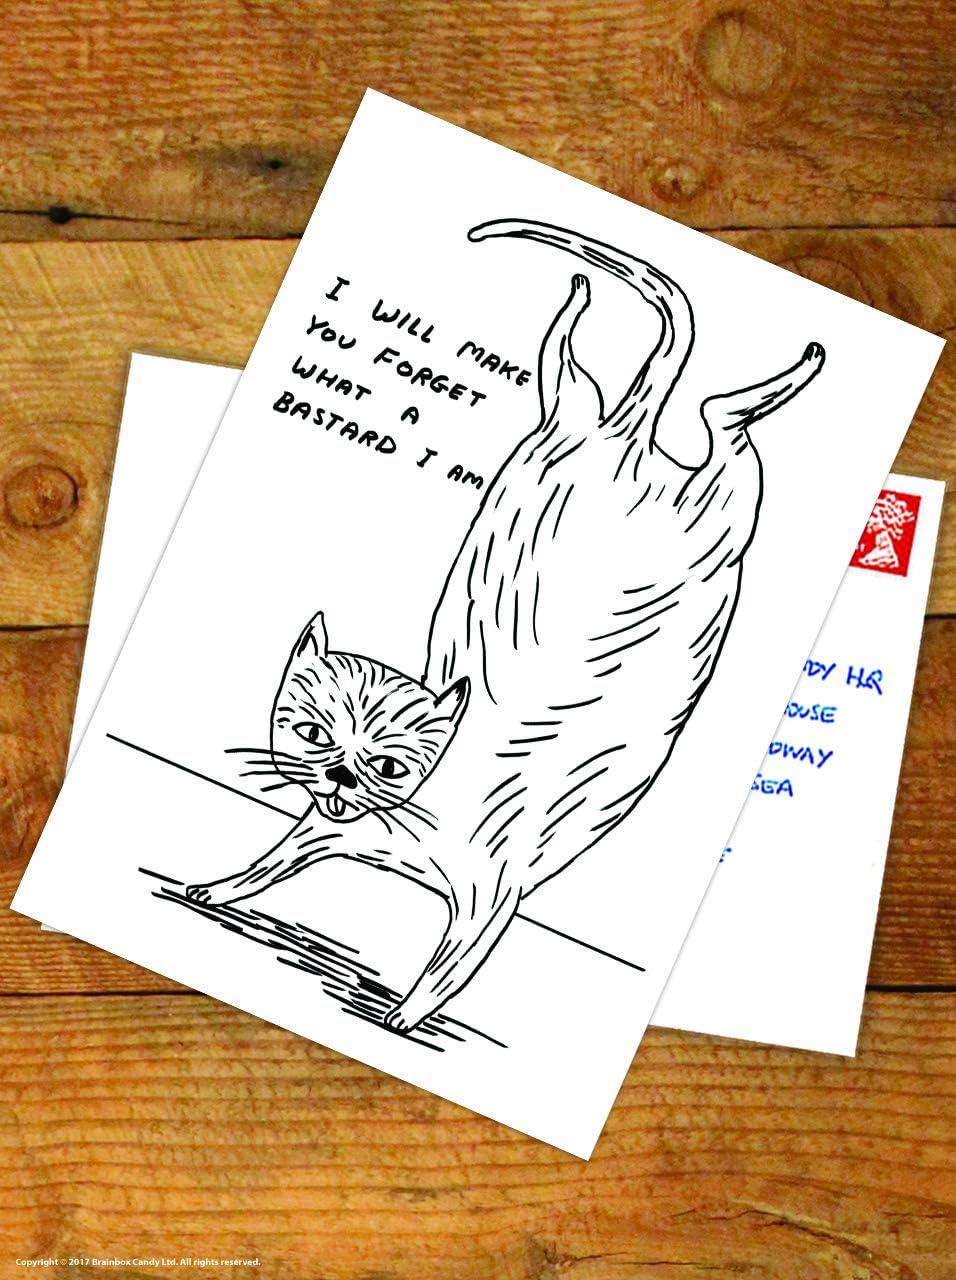 Divertente cartolina ufficiale di David Shrigley Lets Rut